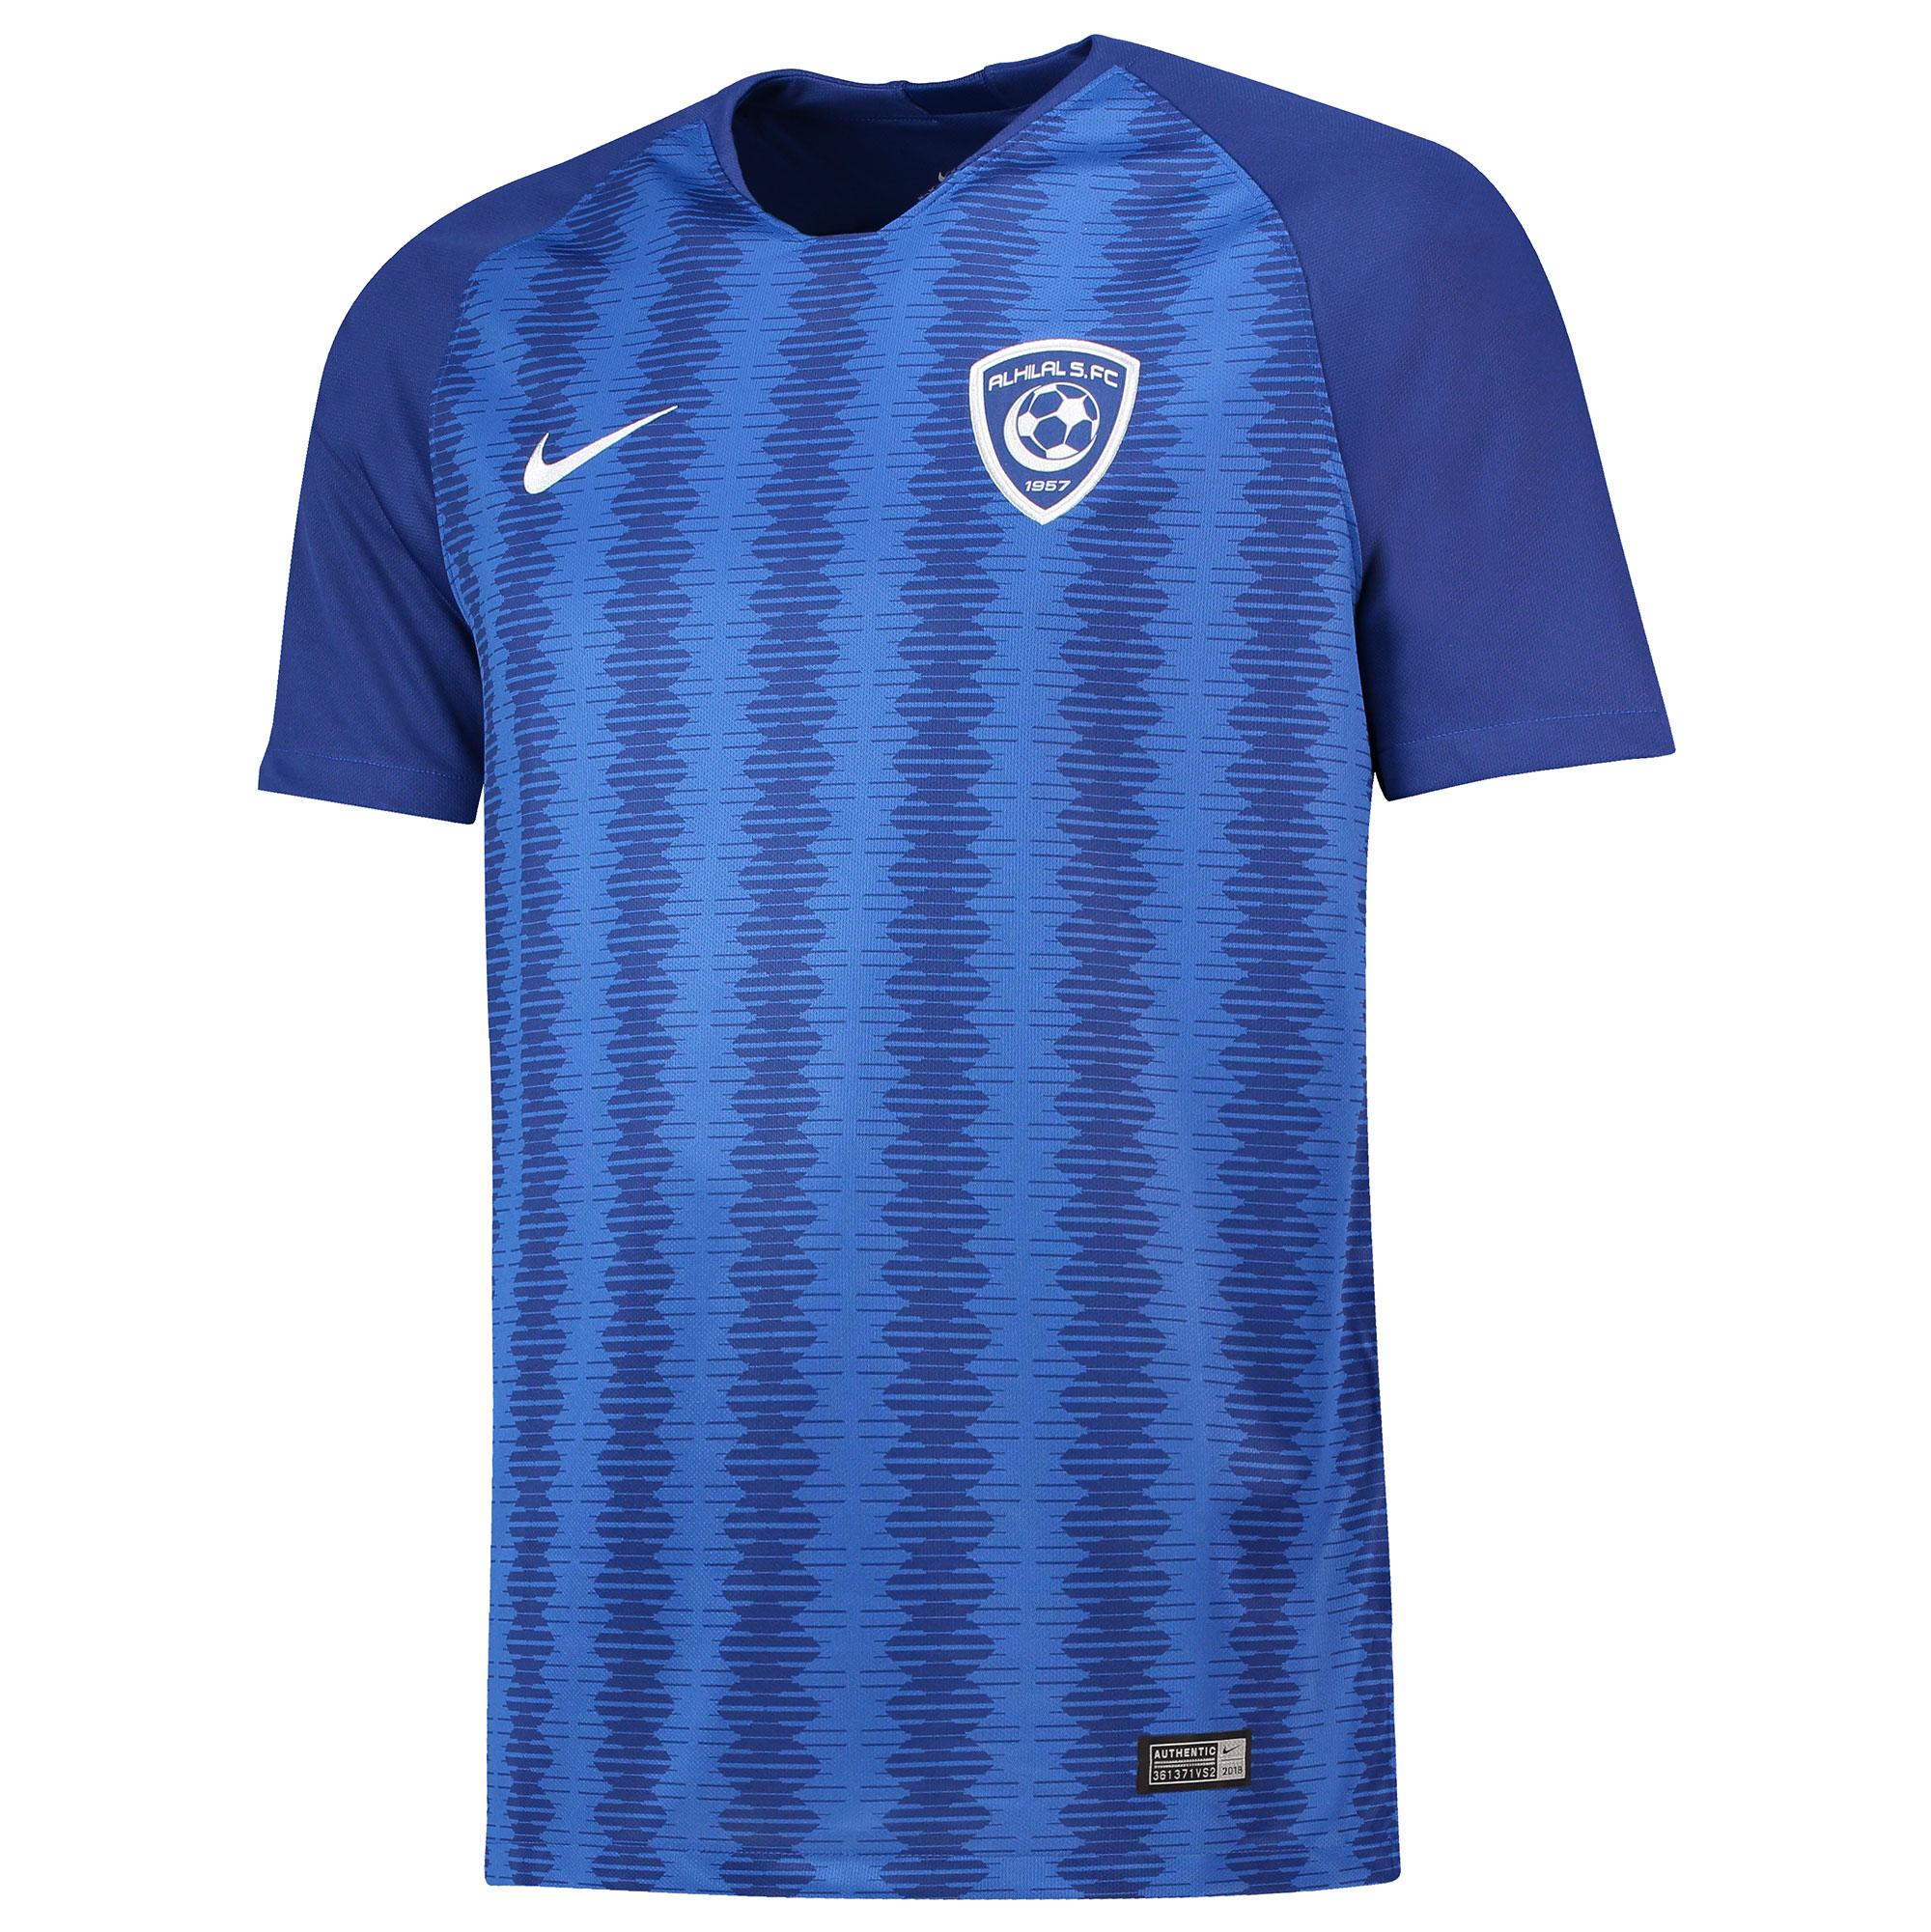 Al Hilal Home Stadium Shirt 2018-19